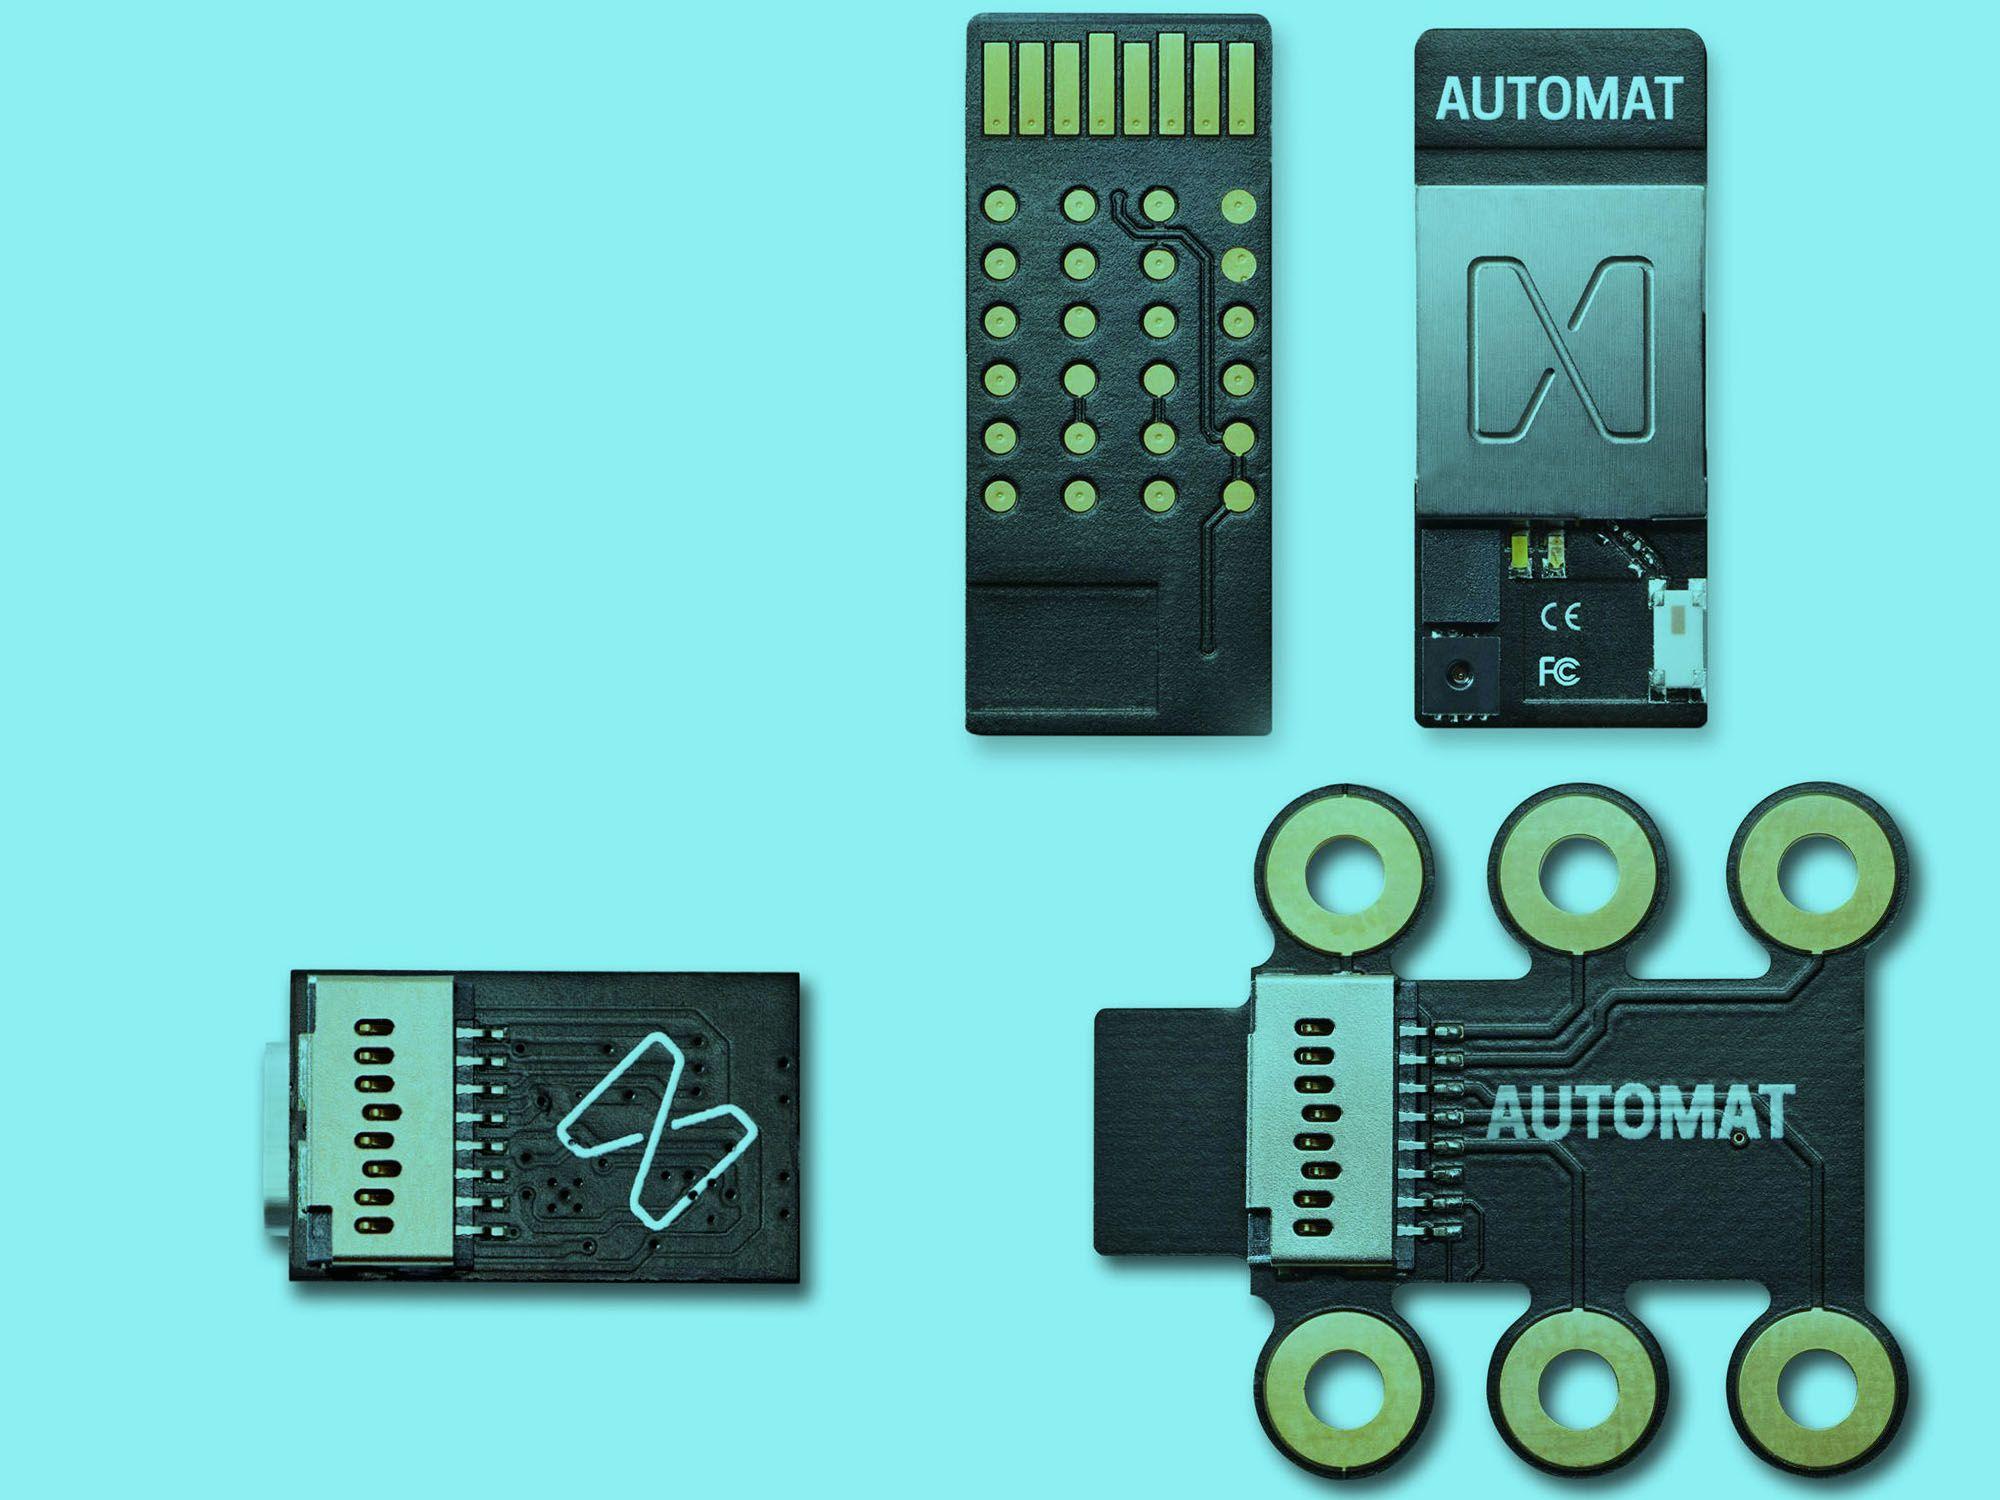 Toolkit.jpg Devices design, Innovation technology